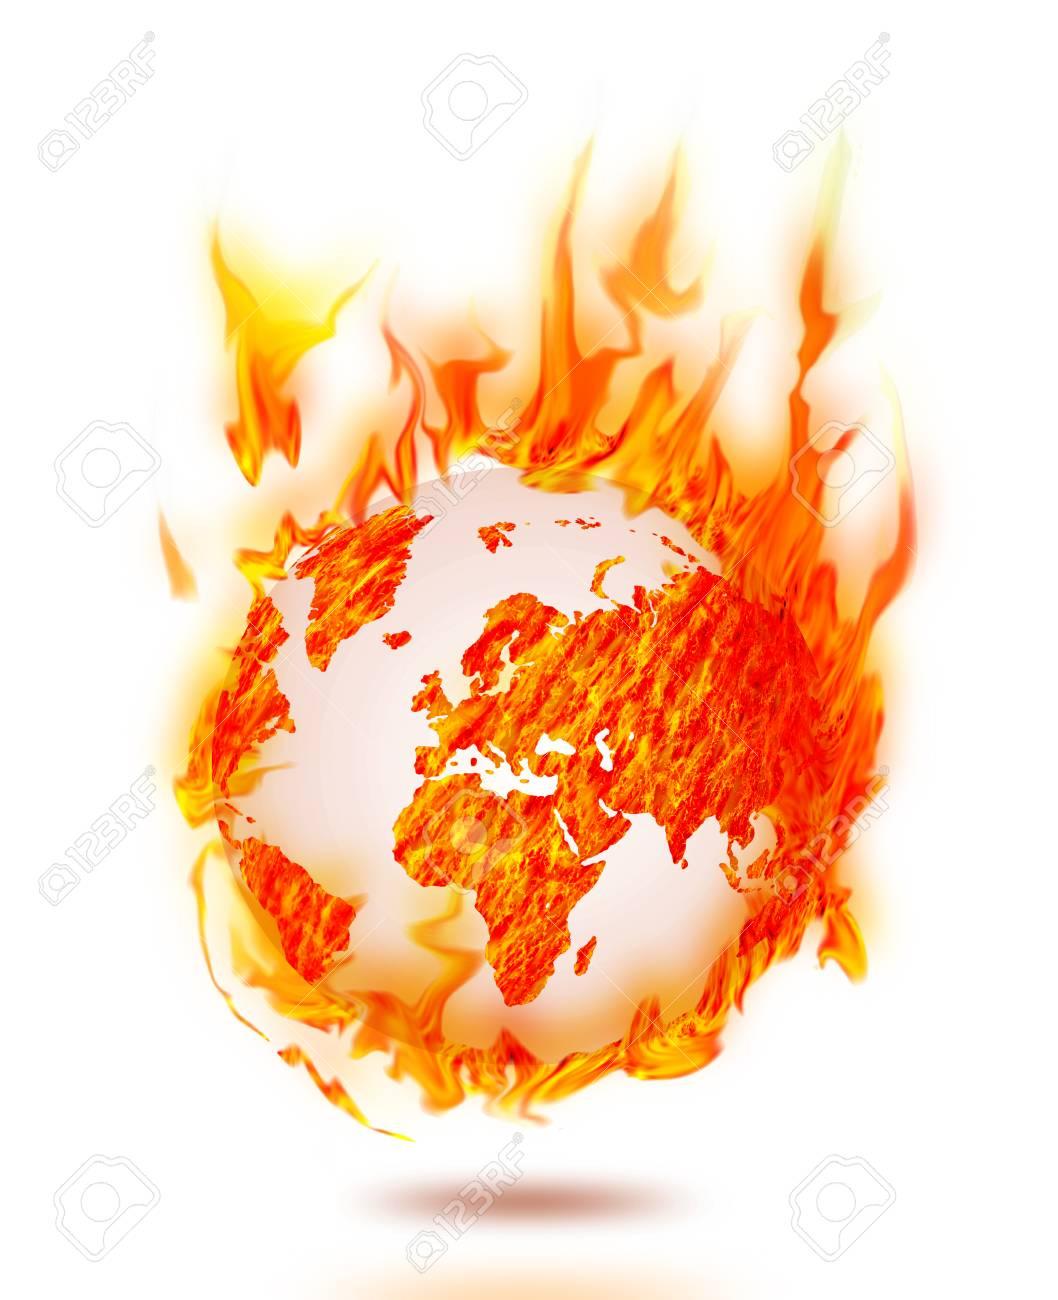 world earth burning - 22584981